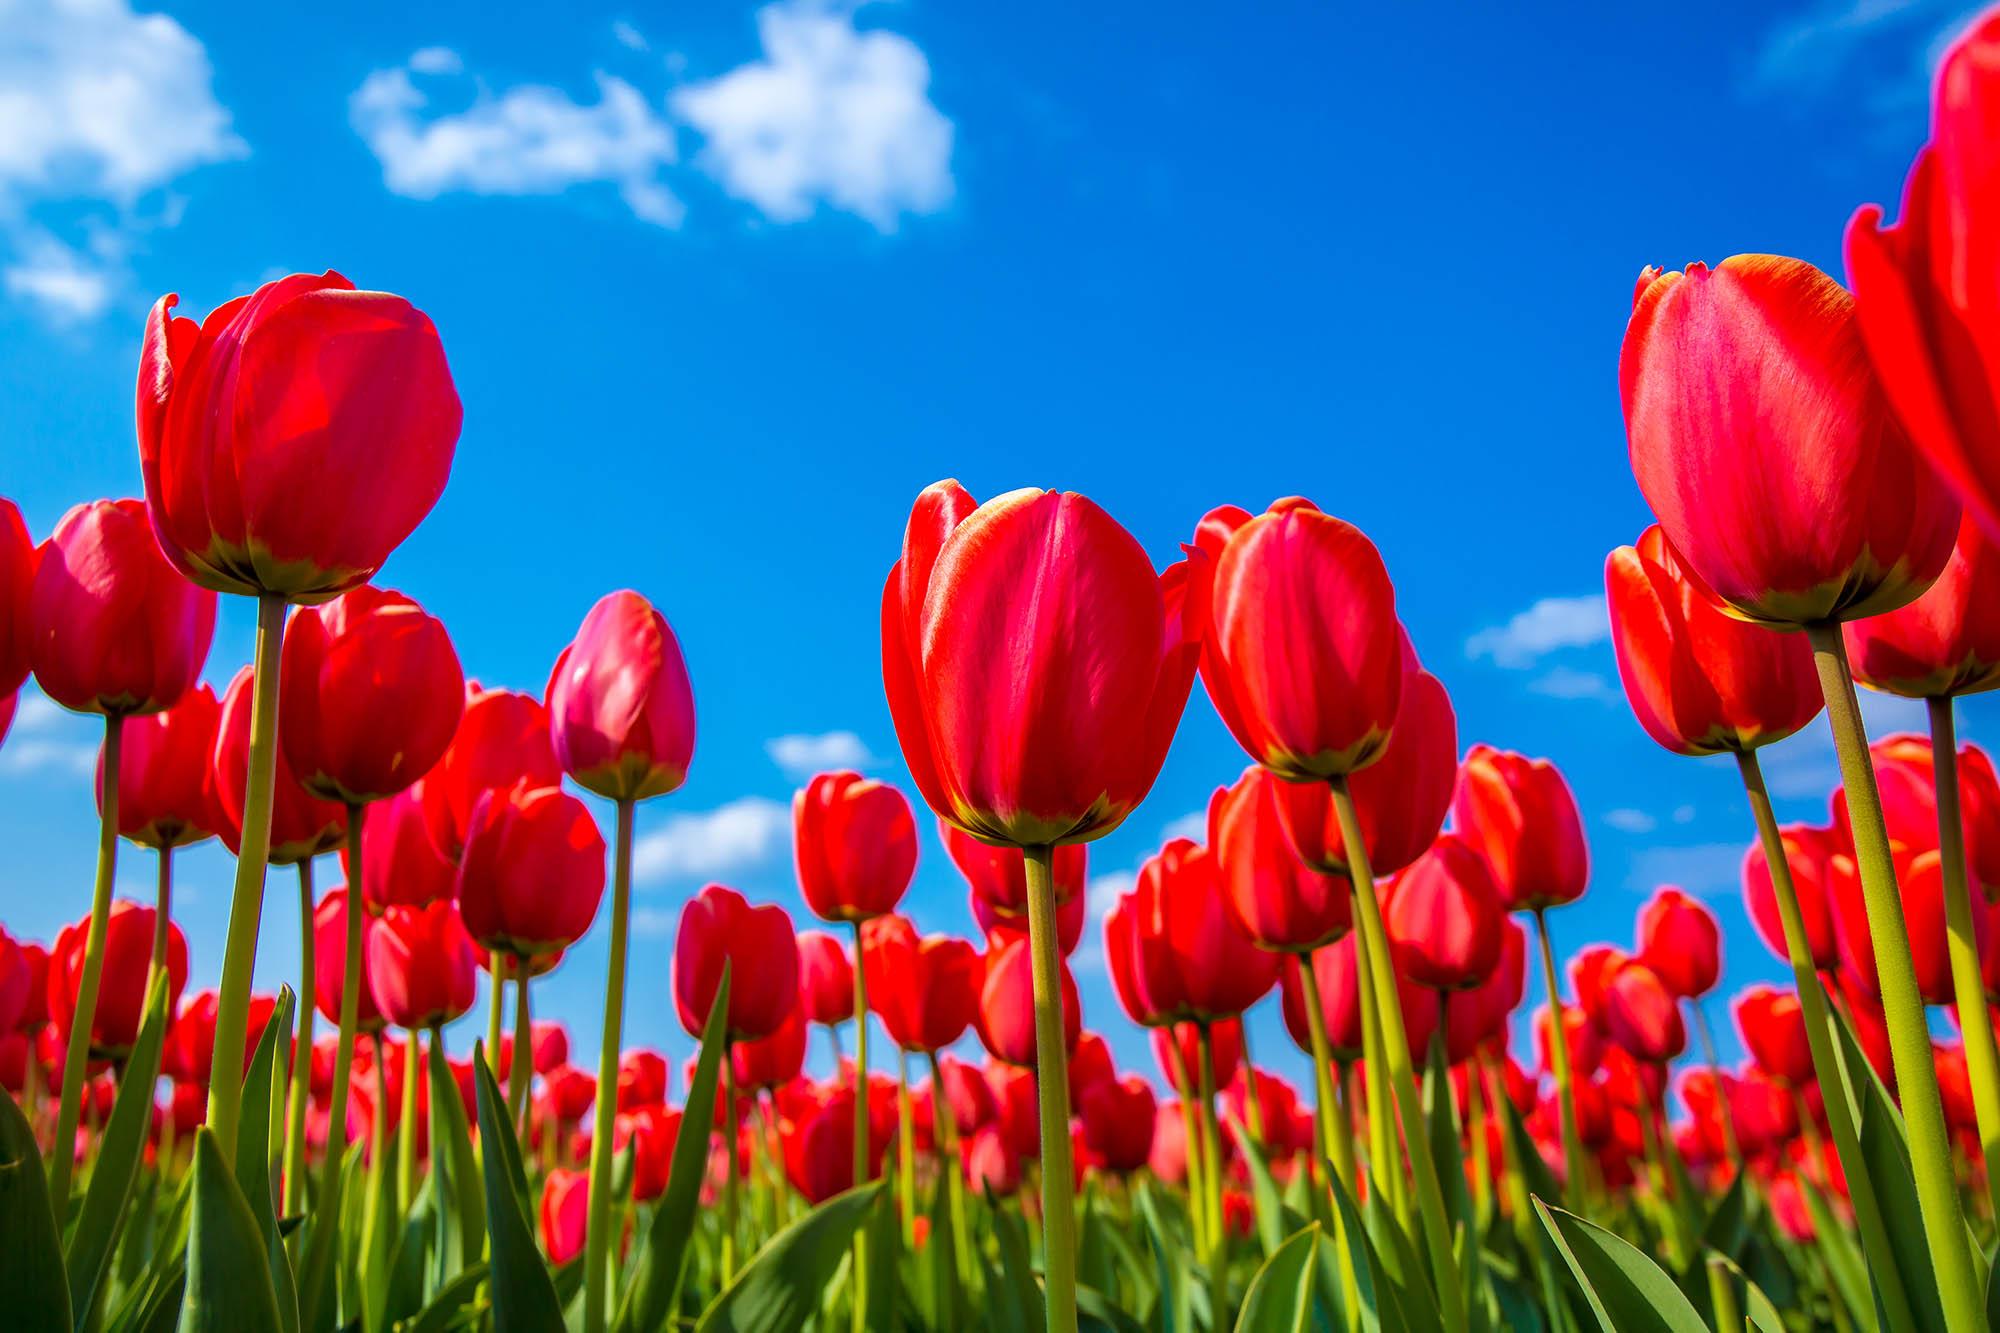 Angiosperms -- flower plants